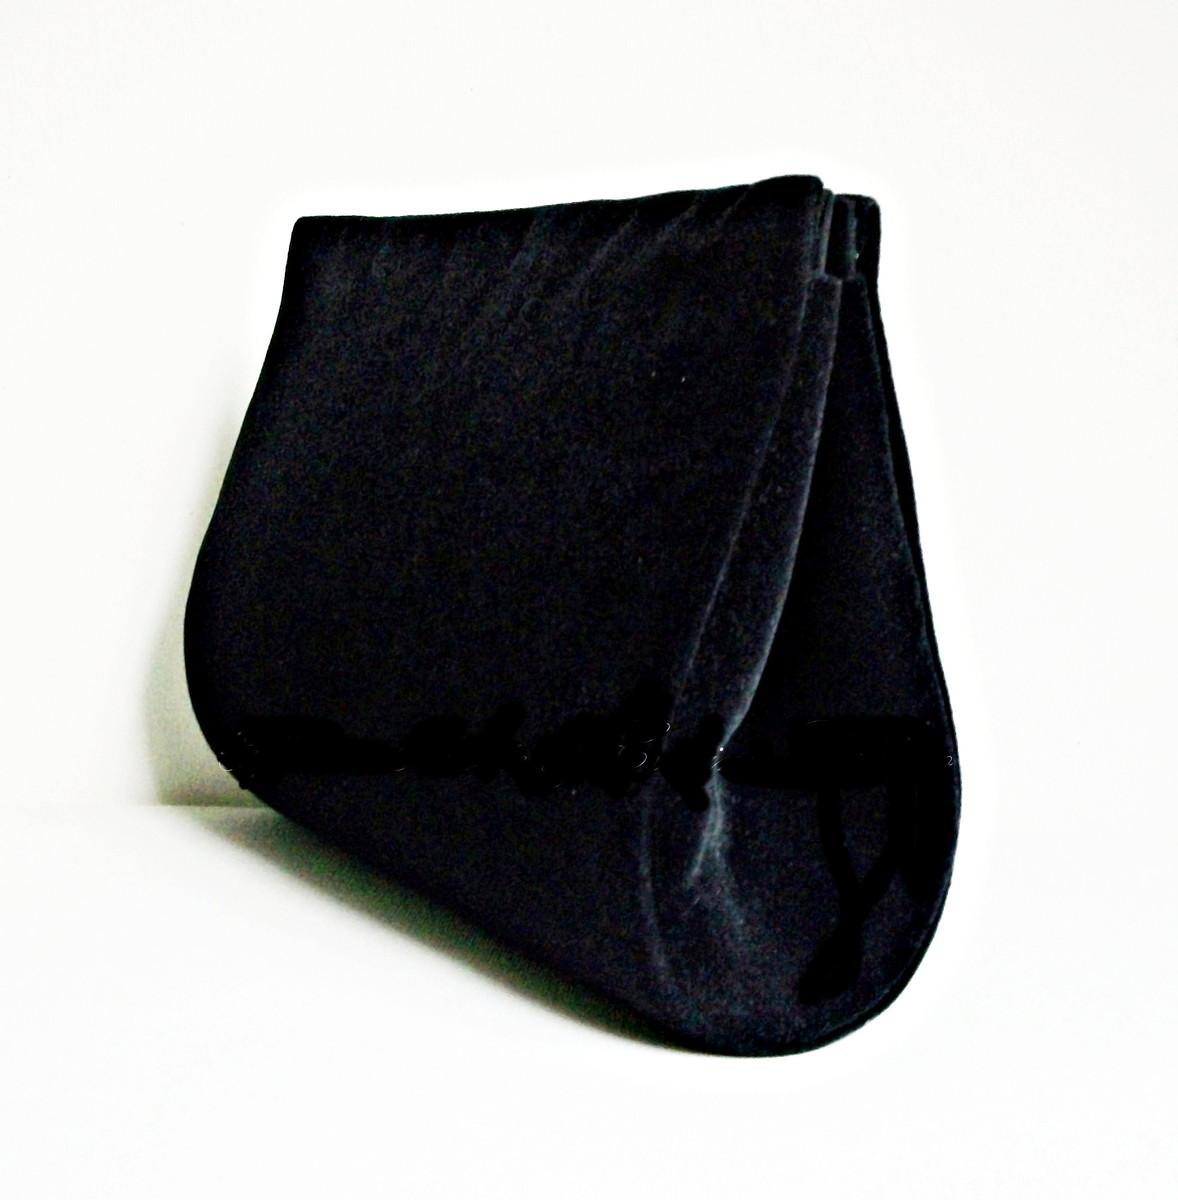 Bolsa De Mao Festas : Bolsa clutch veludo preta oficina de arte elo